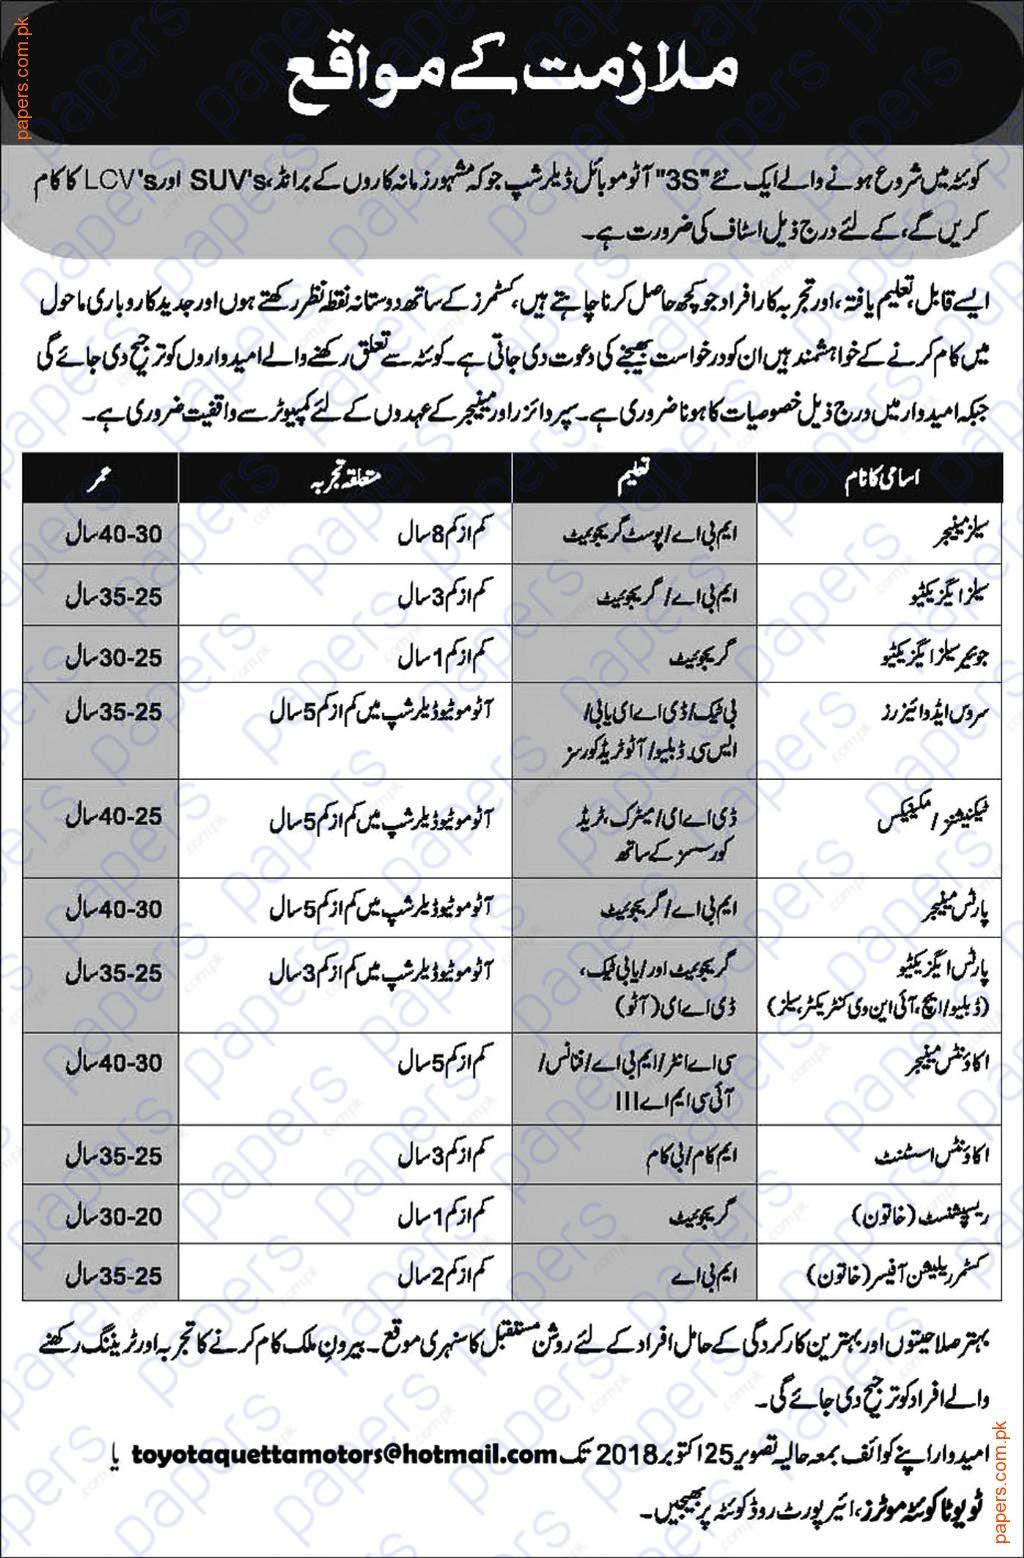 Toyota Quetta Motors jobs 2018 in Pakistan   Government Jobs